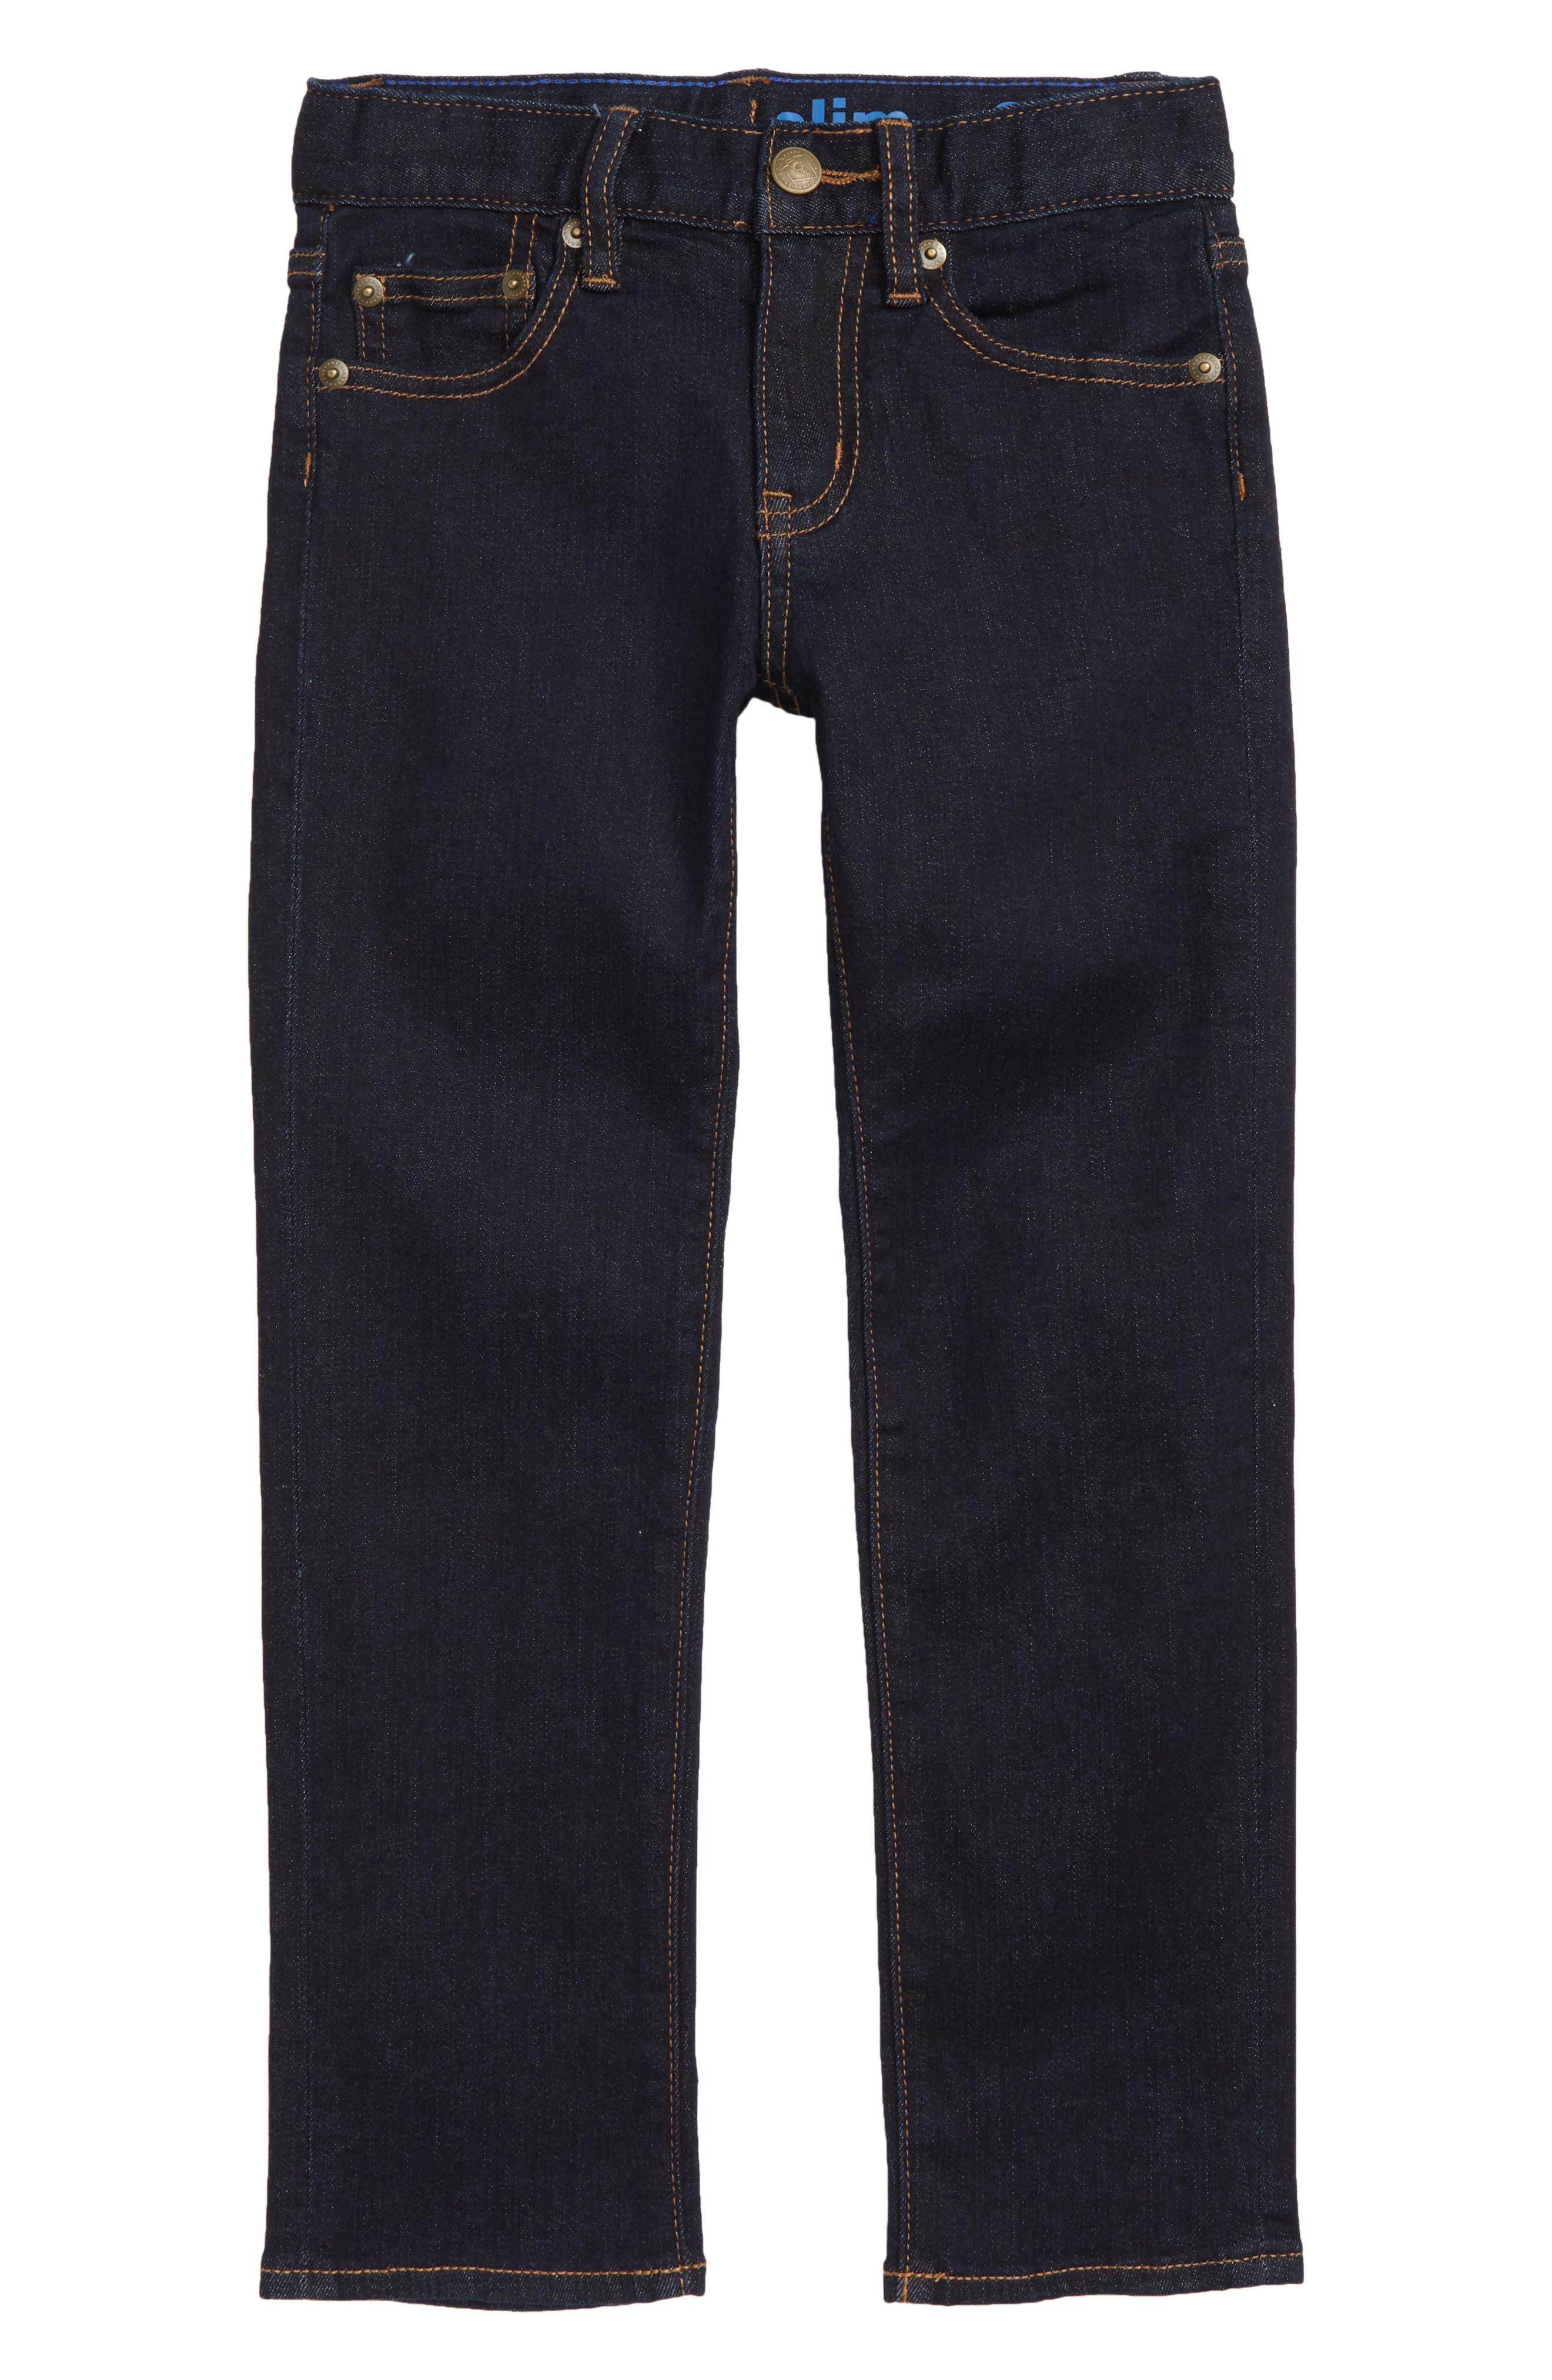 Runaround Slim Jeans,                             Main thumbnail 1, color,                             400